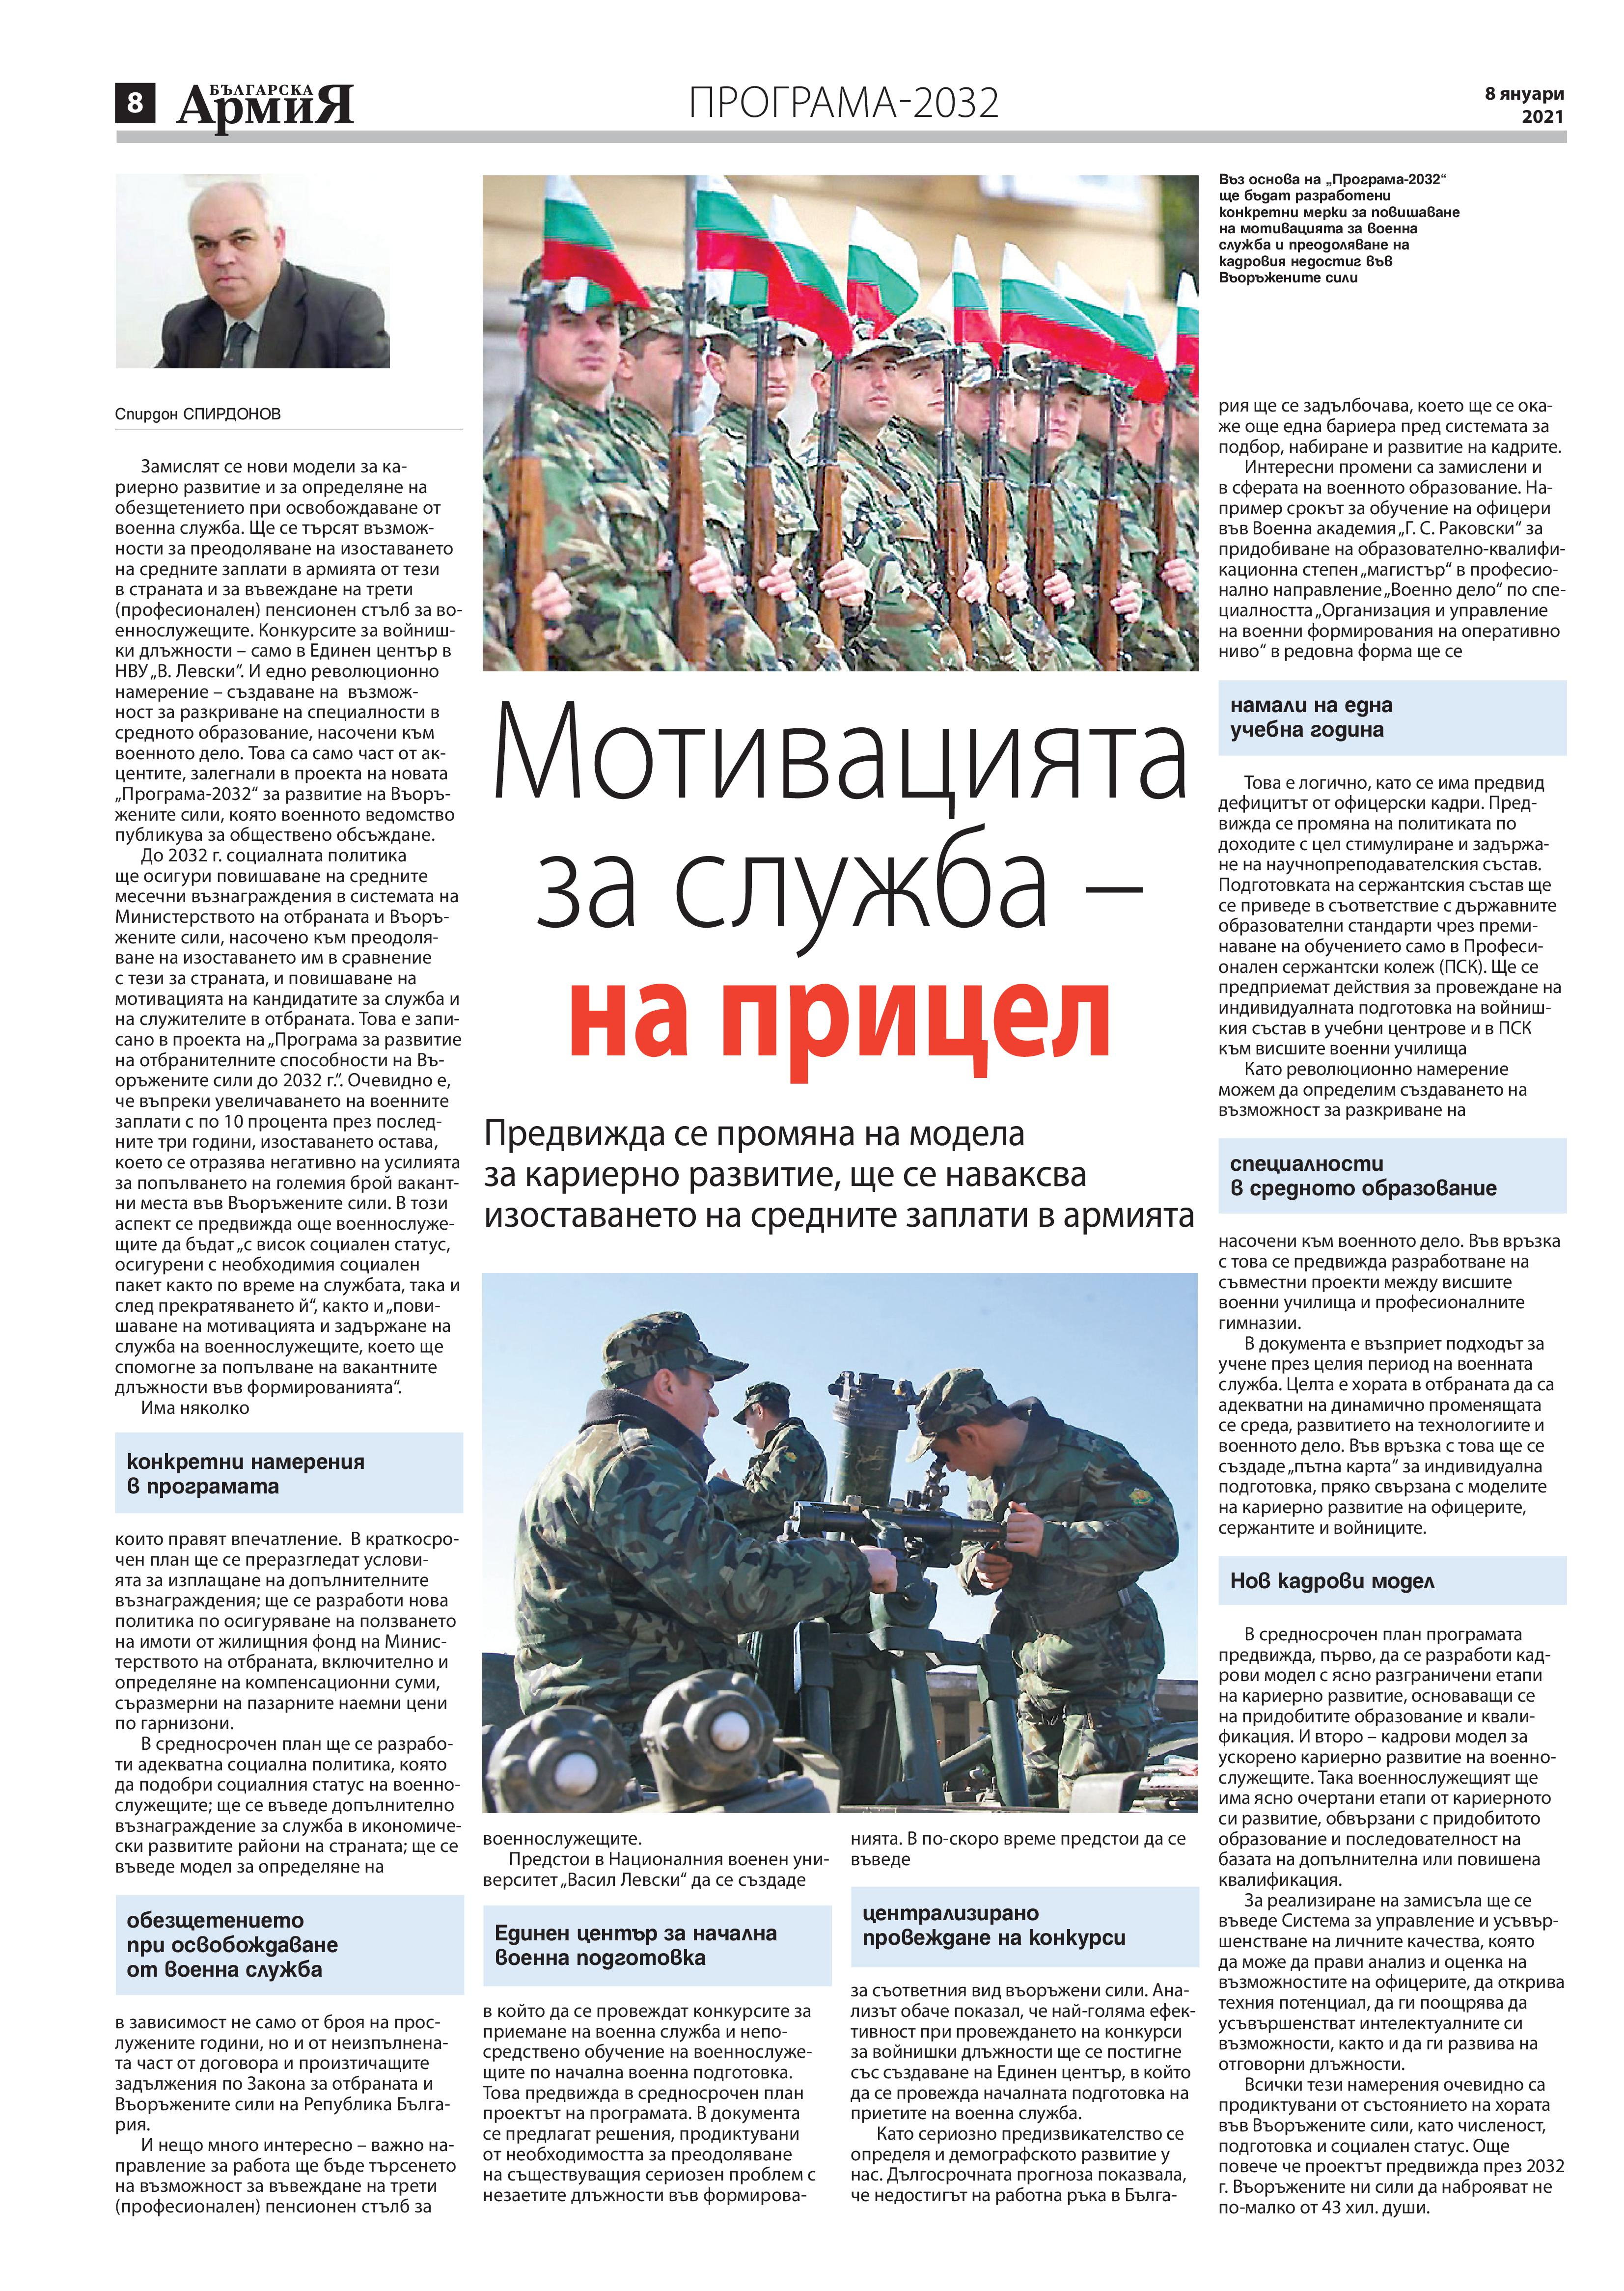 https://www.armymedia.bg/wp-content/uploads/2015/06/08-54.jpg